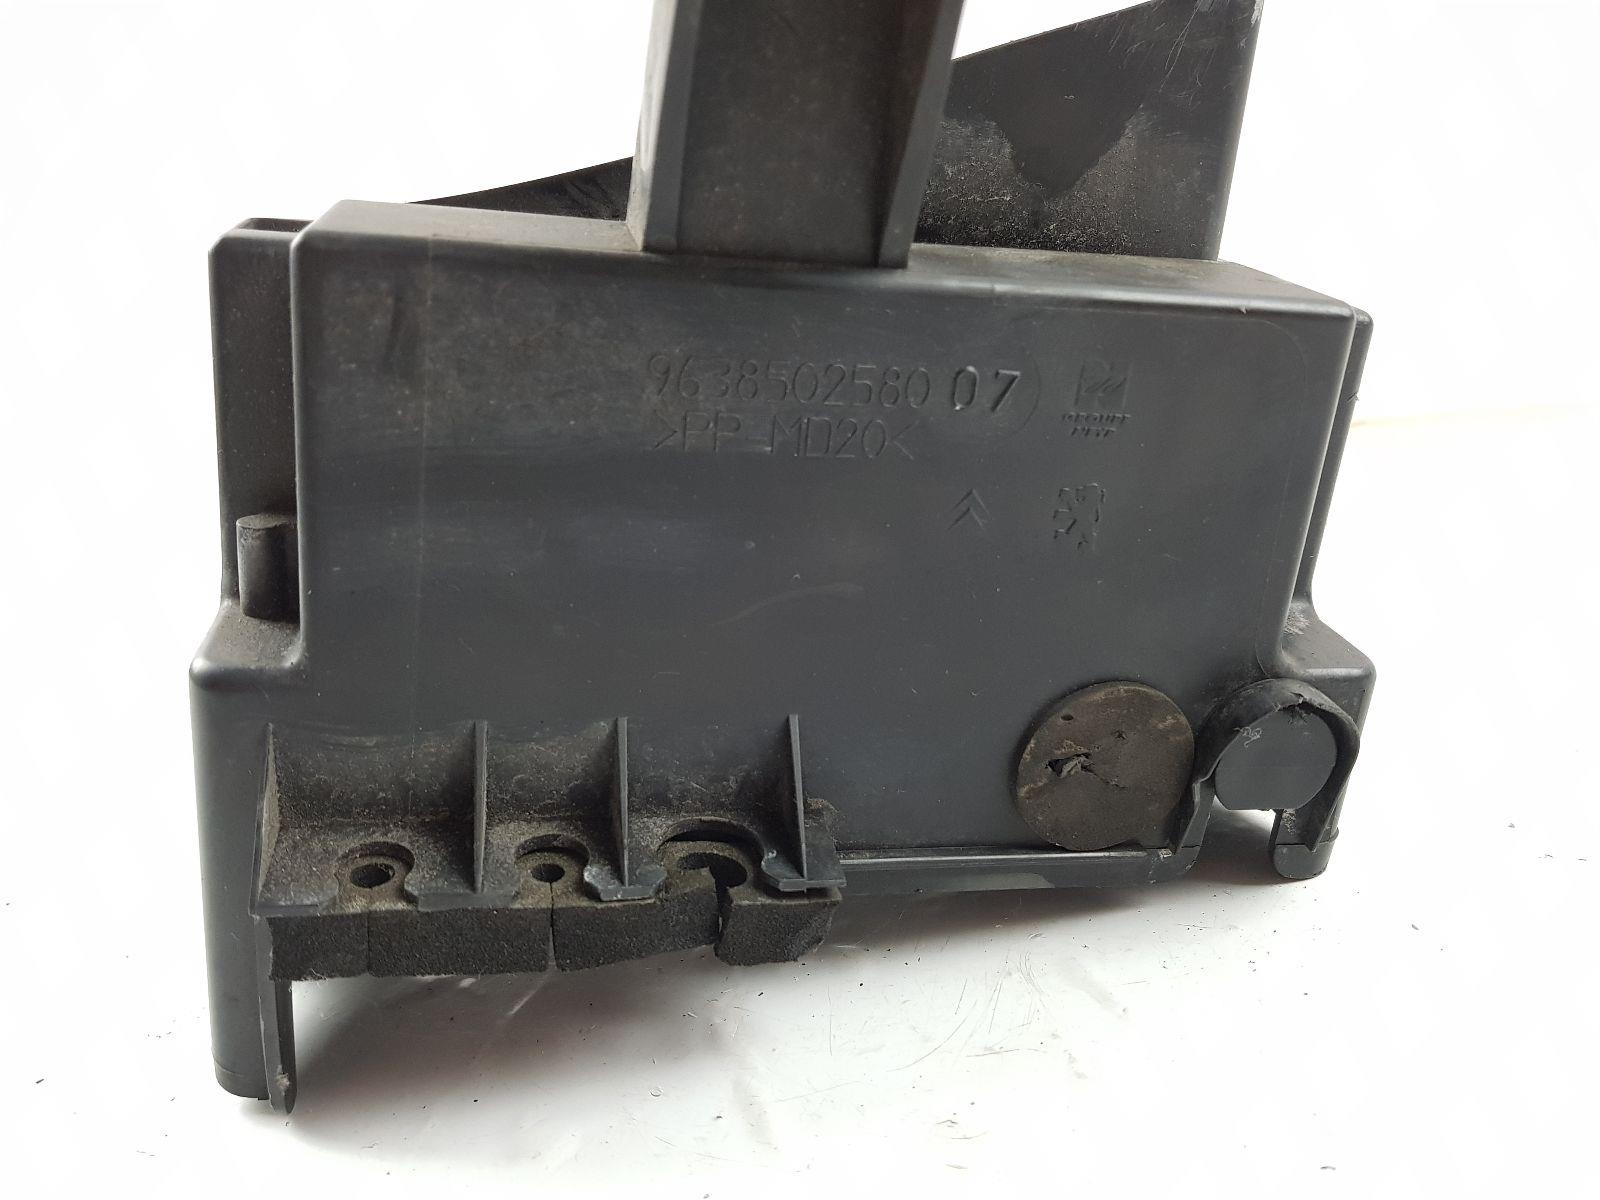 hight resolution of  2003 2008 mk1 citroen c2 fuse box 1 1 petrol 9638502580